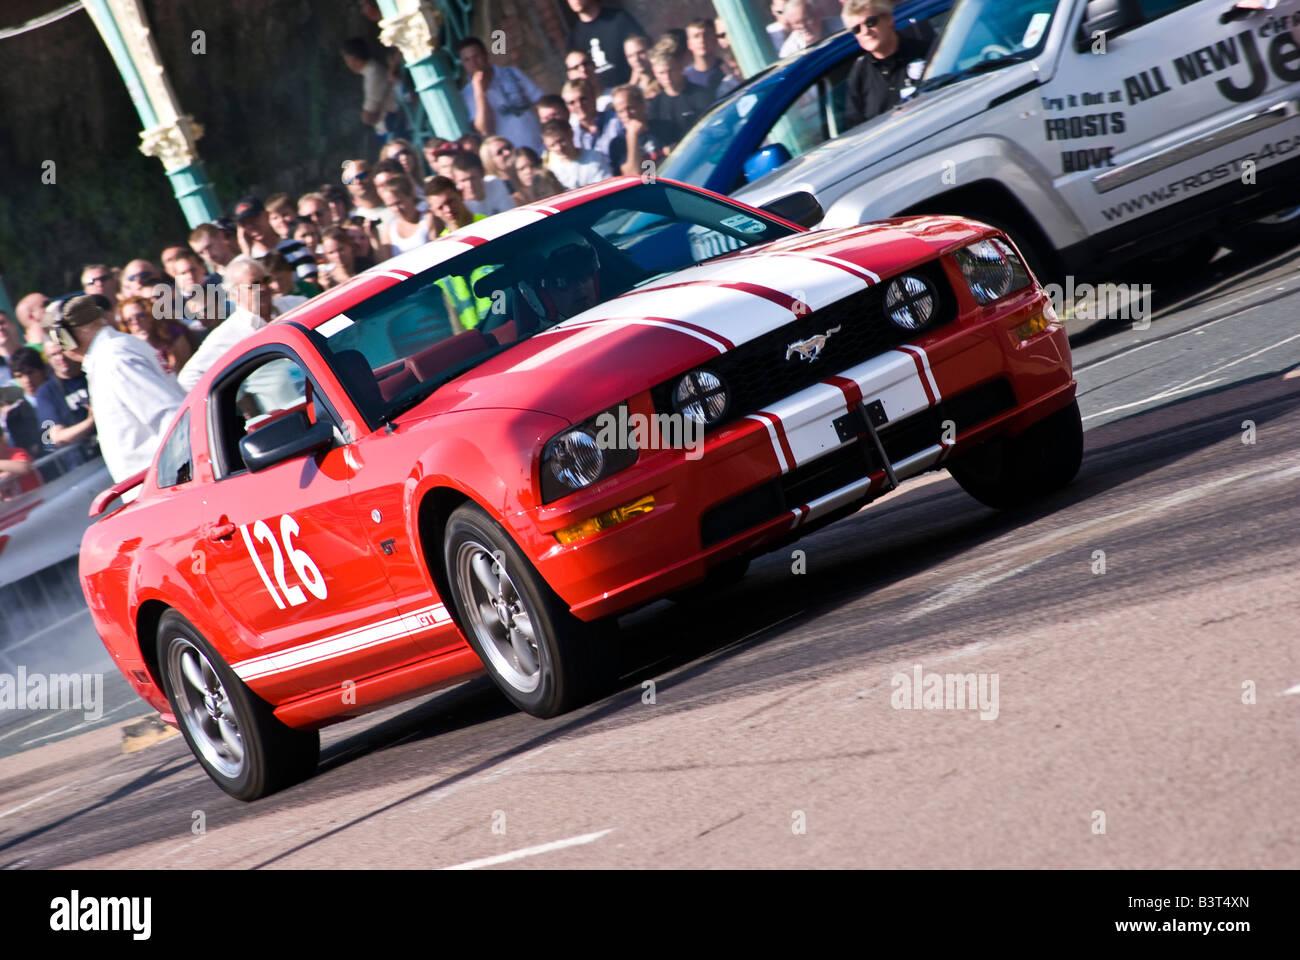 Ford Gt Drag Racer Speeds Off The Start Line Stock Image